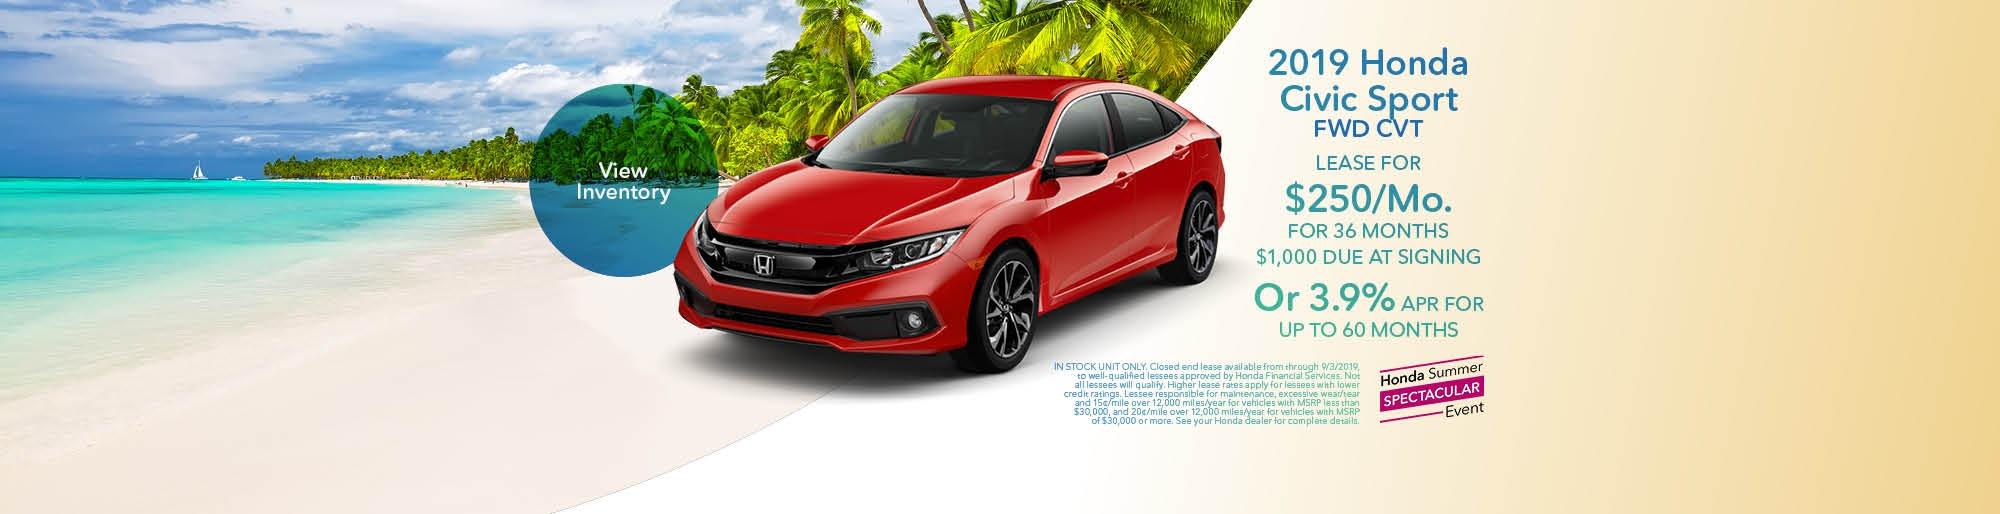 Concord Honda: New & Used Car Dealership